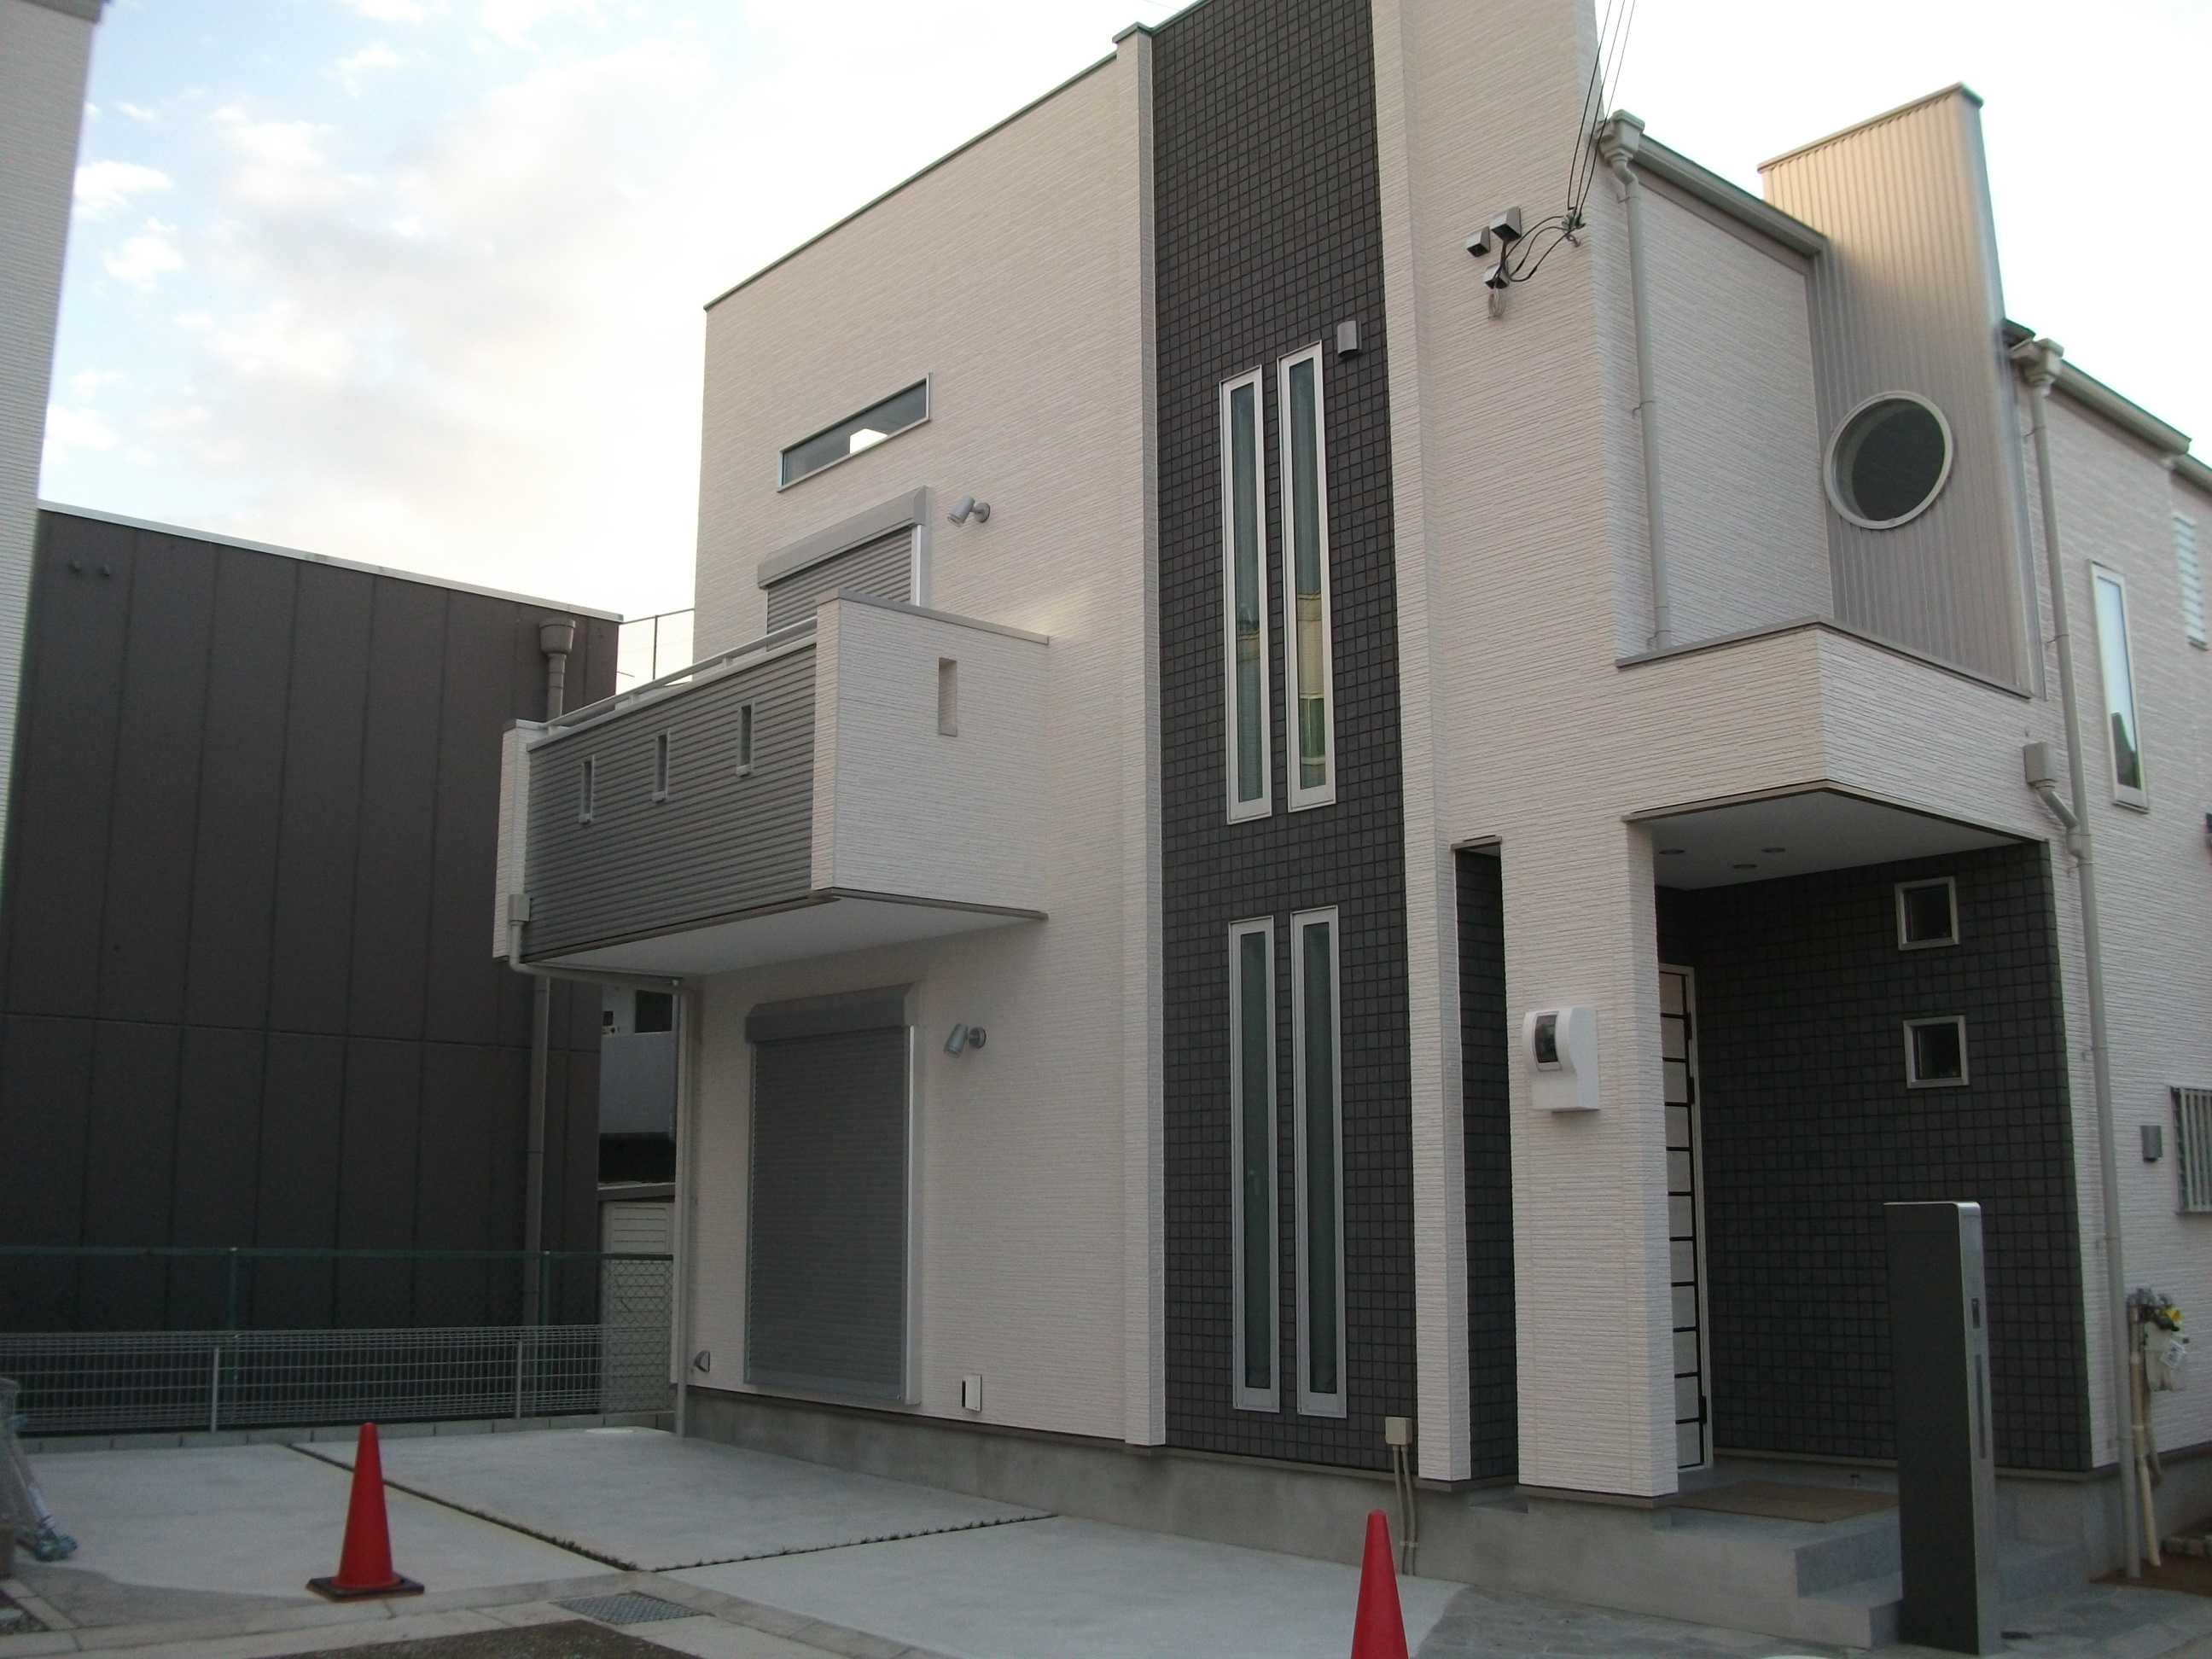 宝塚市 個人住宅新築工事イメージ03